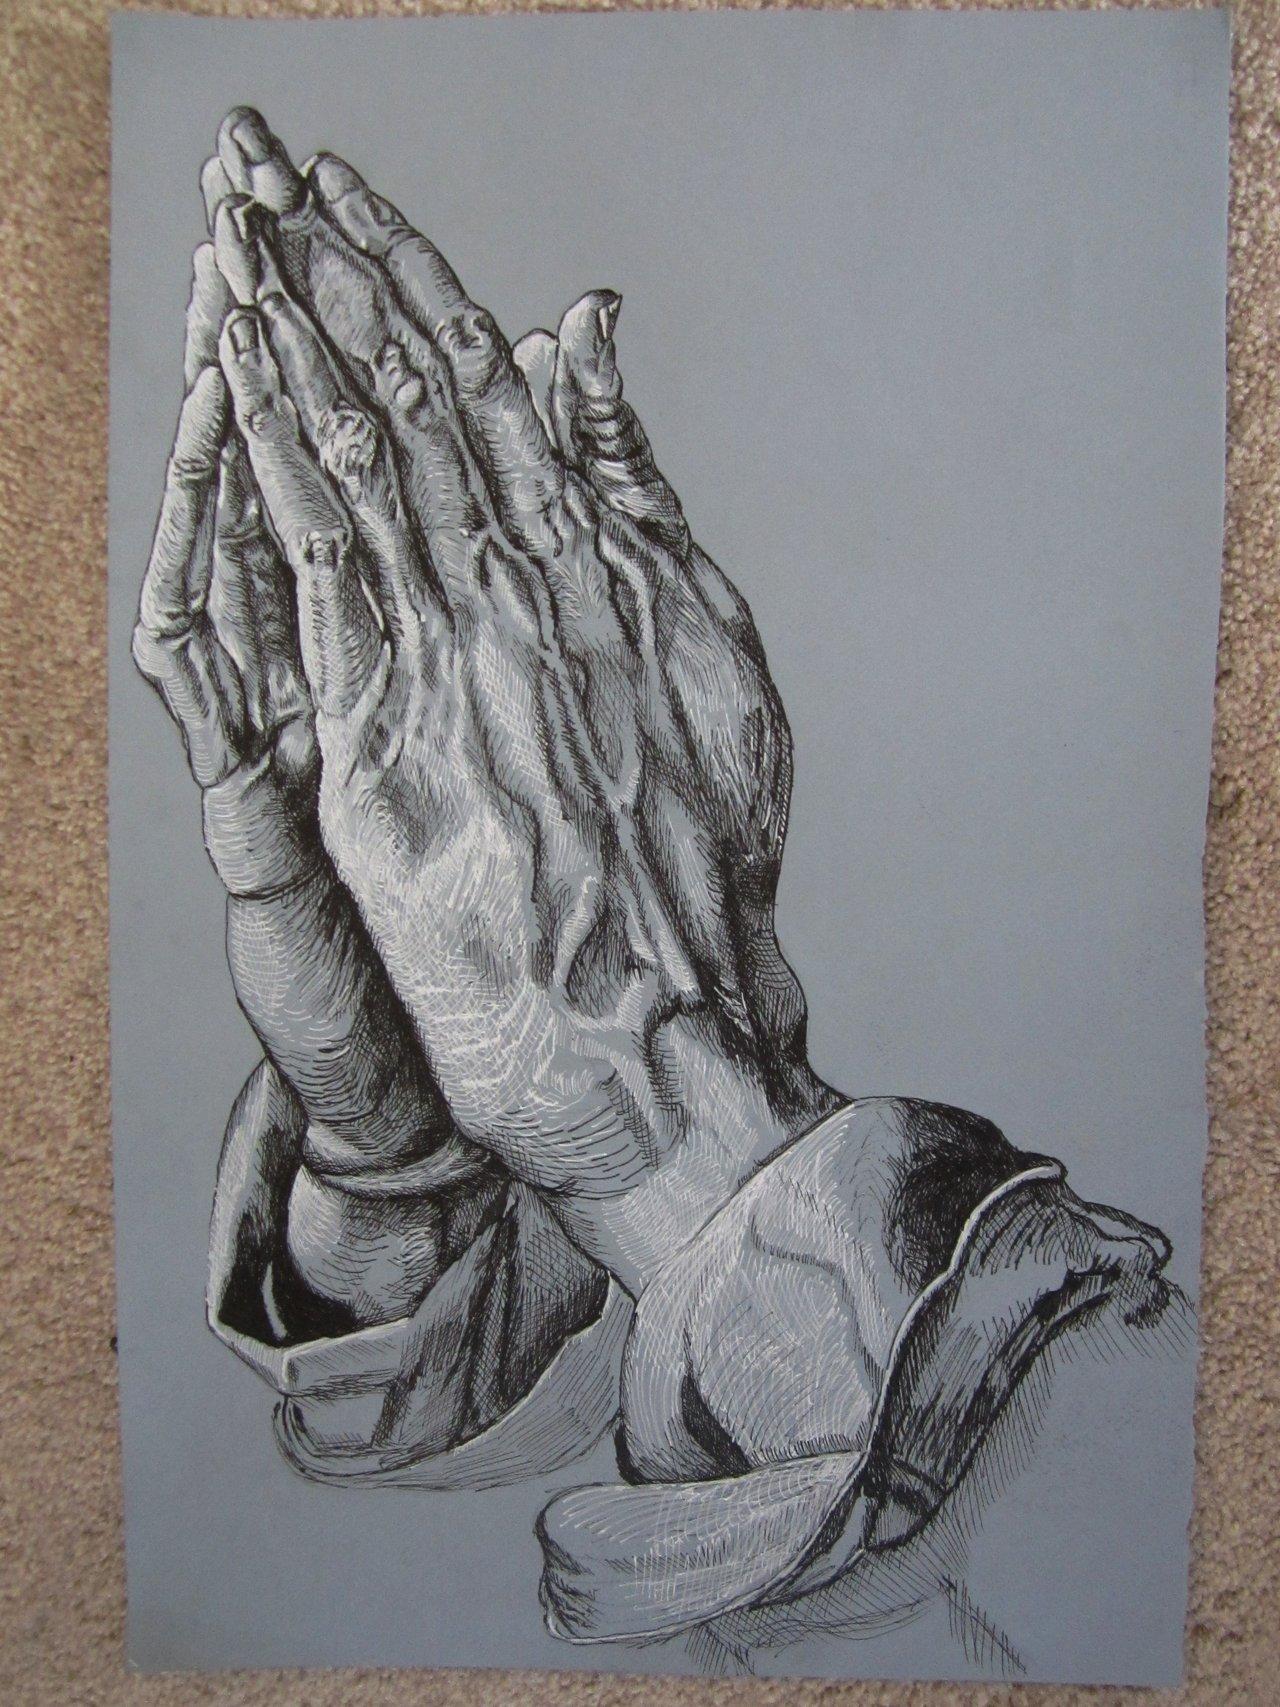 1280x1707 Praying Hands